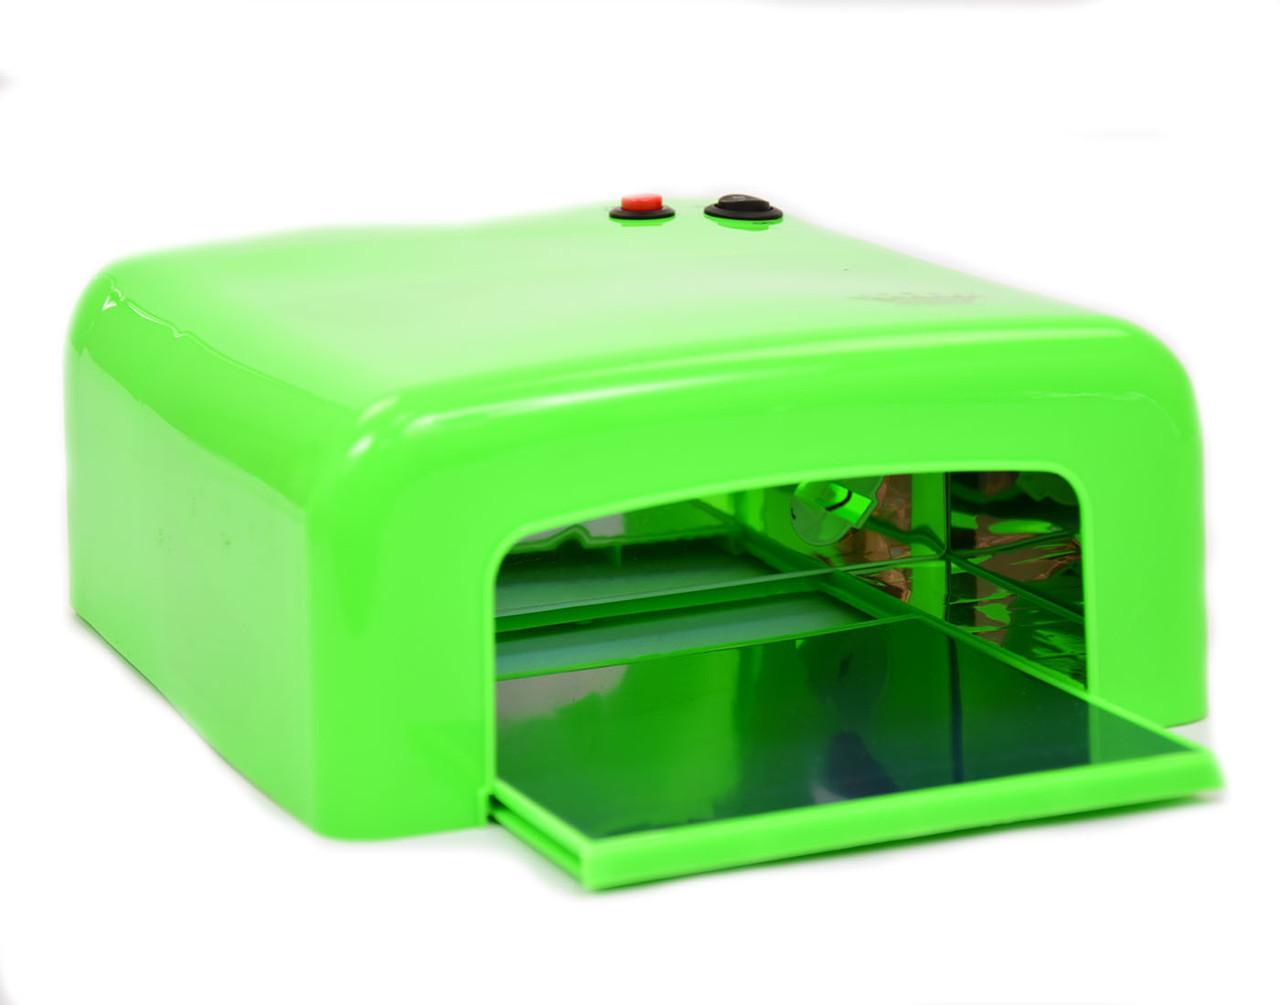 Уф лампа для маникюра,  36 Вт, зеленая